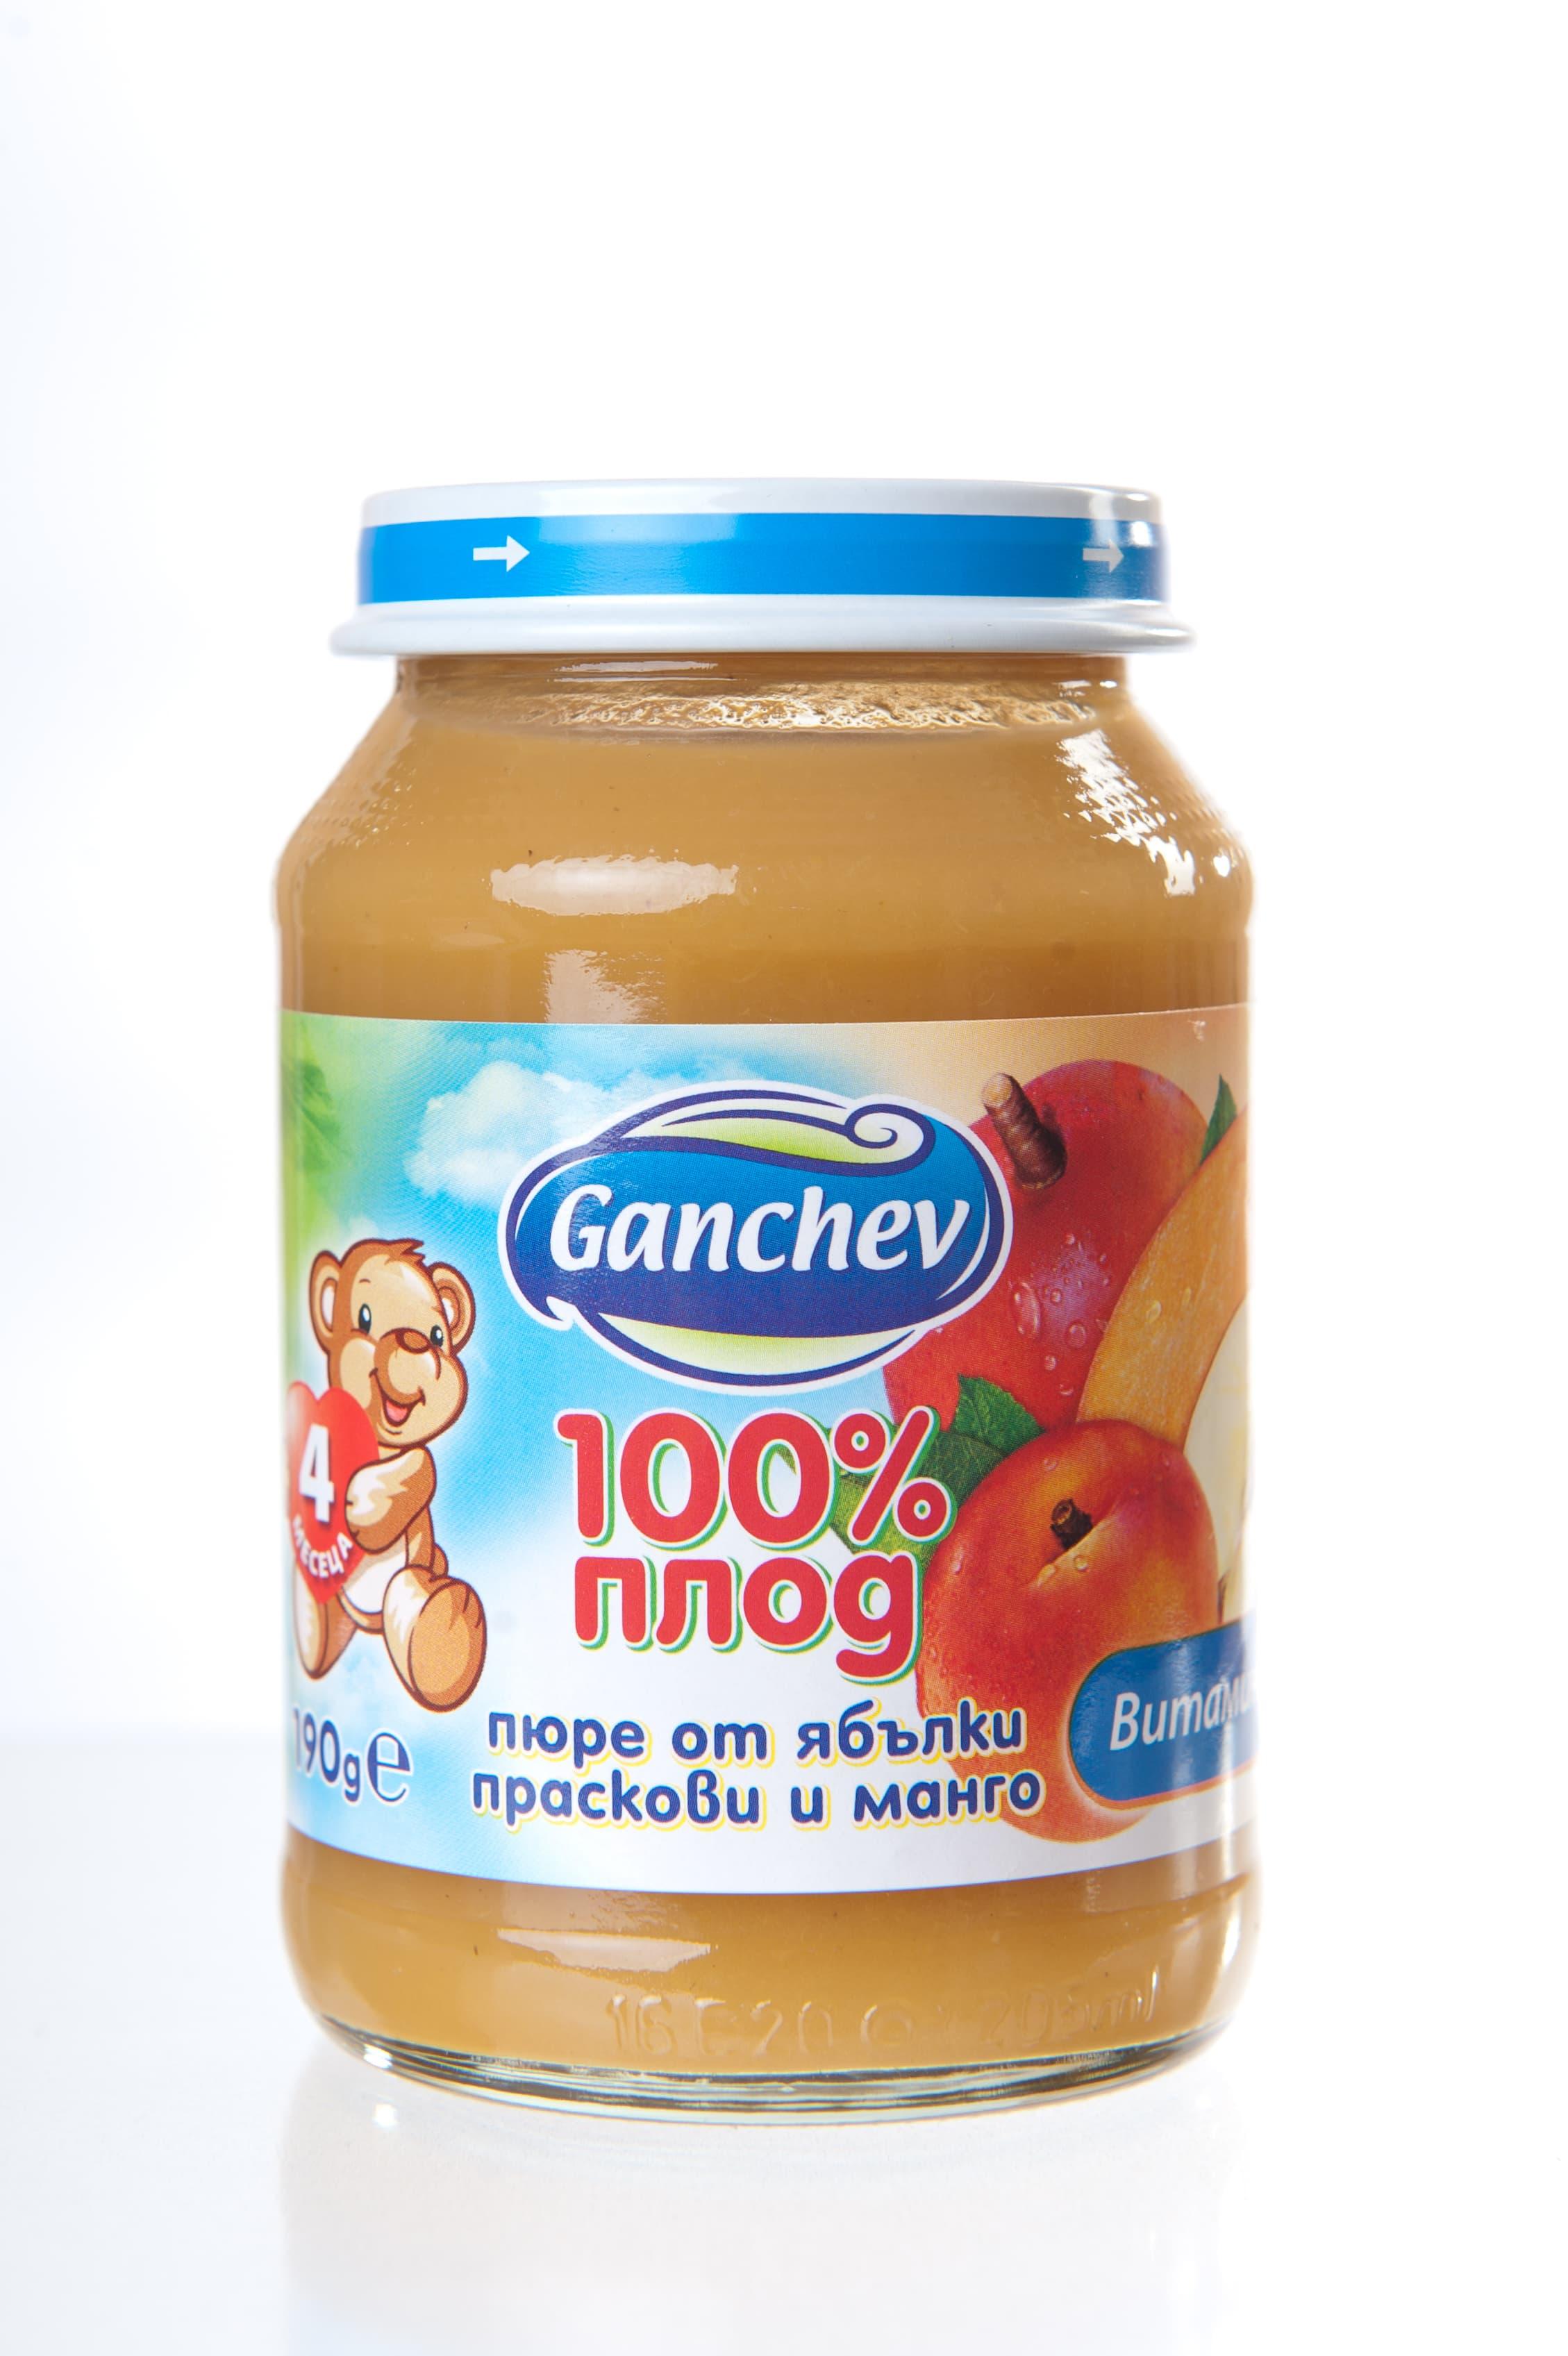 Ganchev-пюре ябълки праскови и манго 4м+190гр